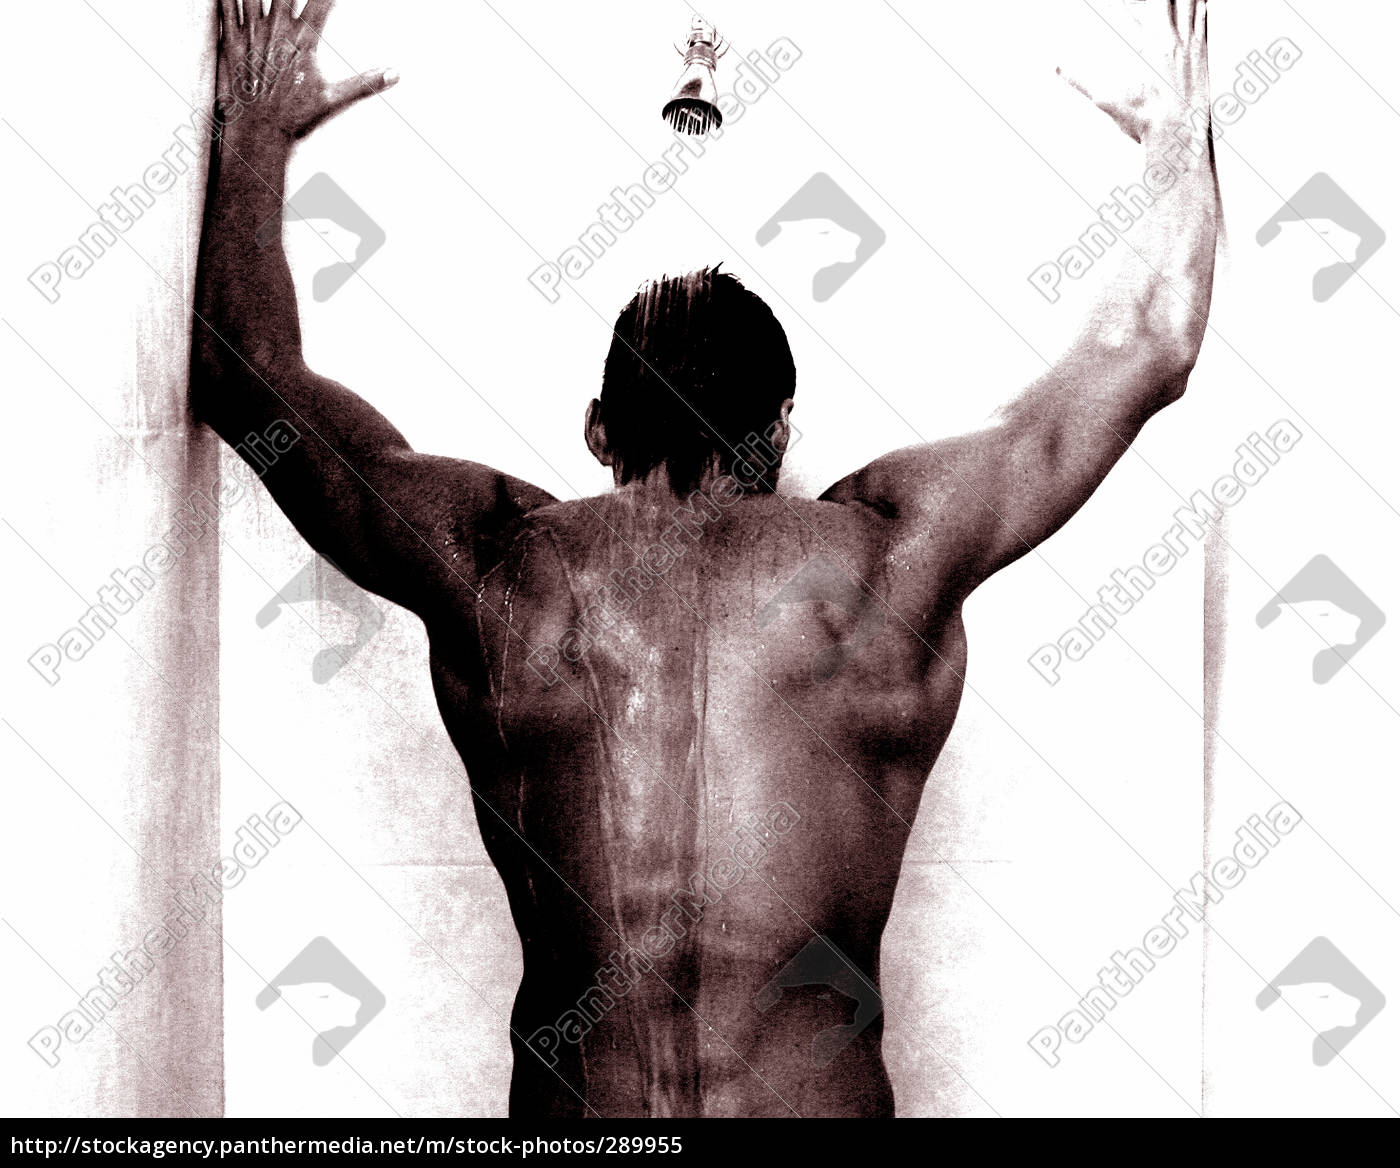 take, a, shower, ..., for, men - 289955